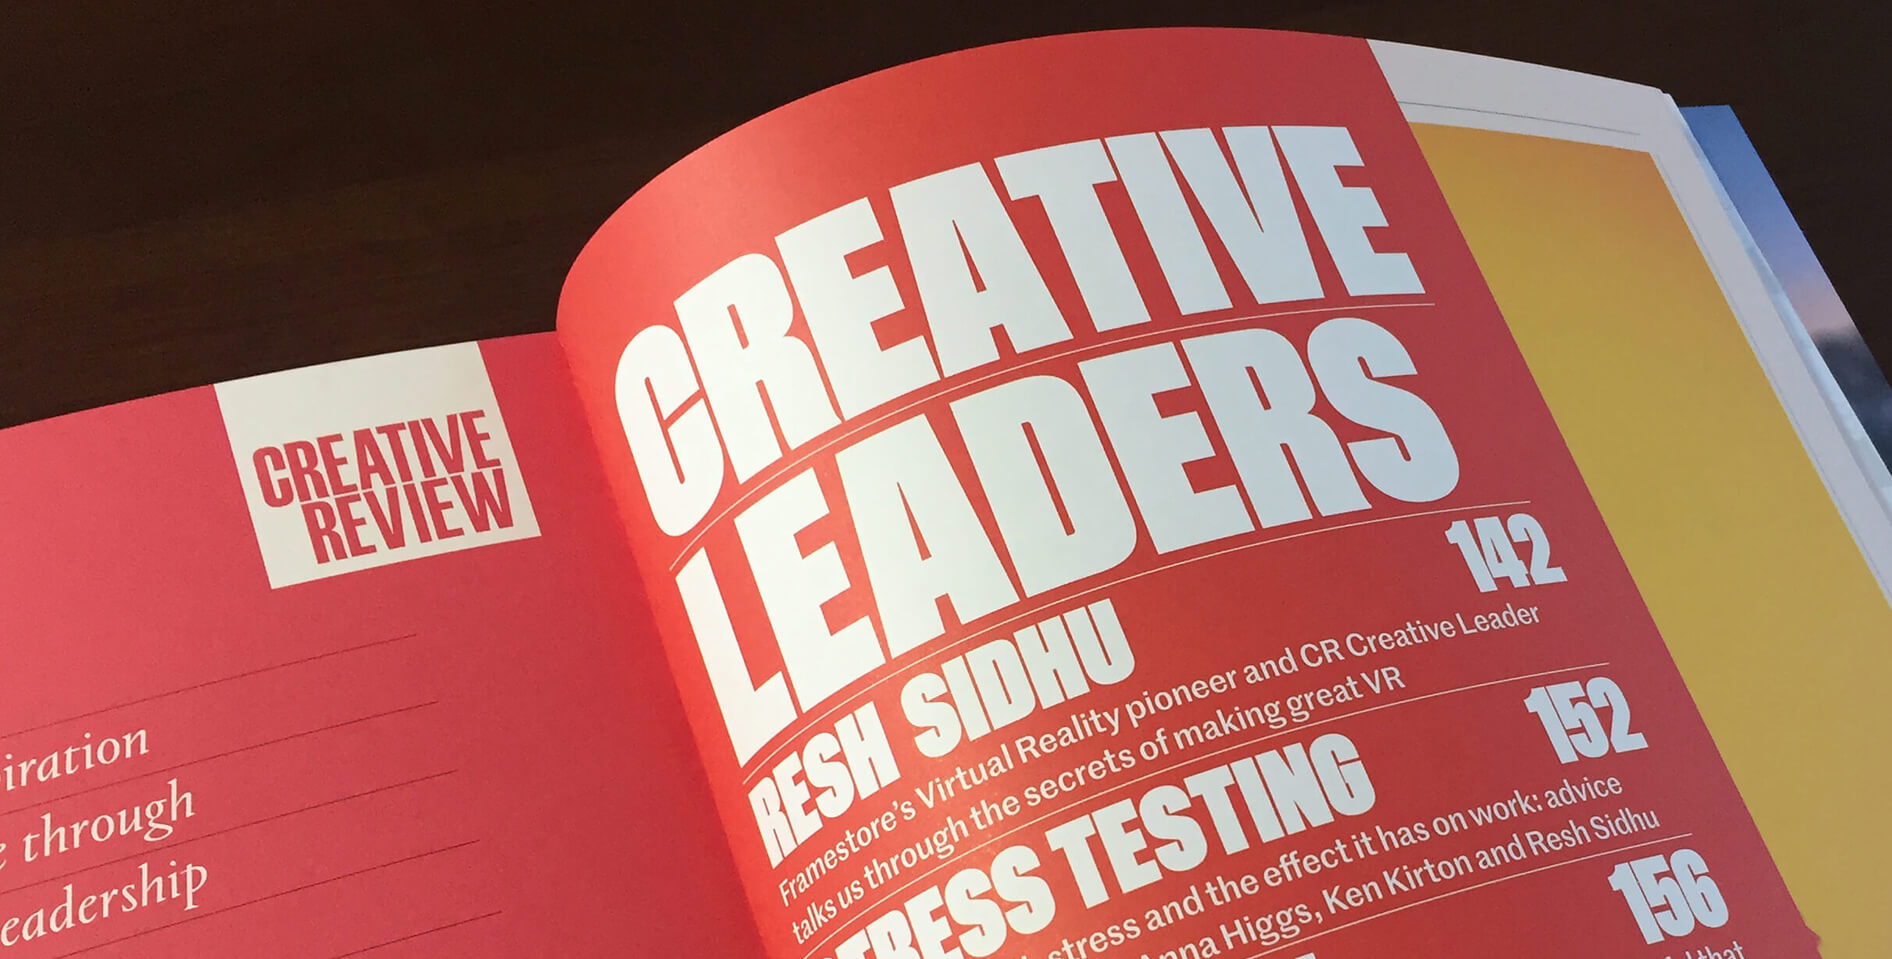 Top 50 Creative Leaders